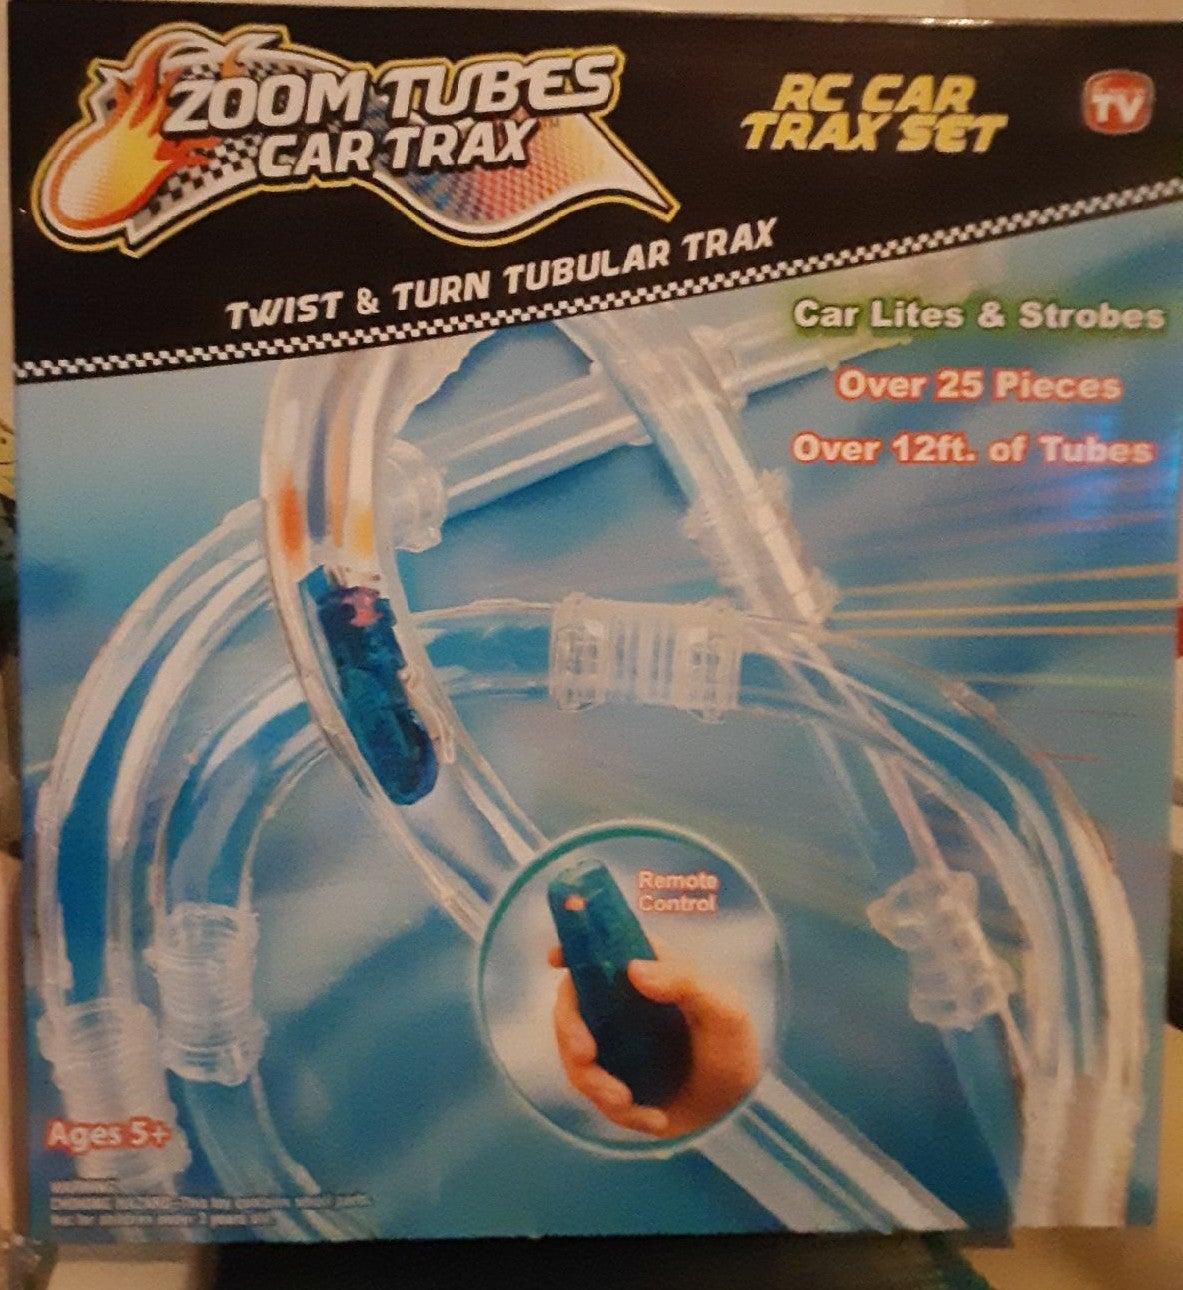 Zoom tubes